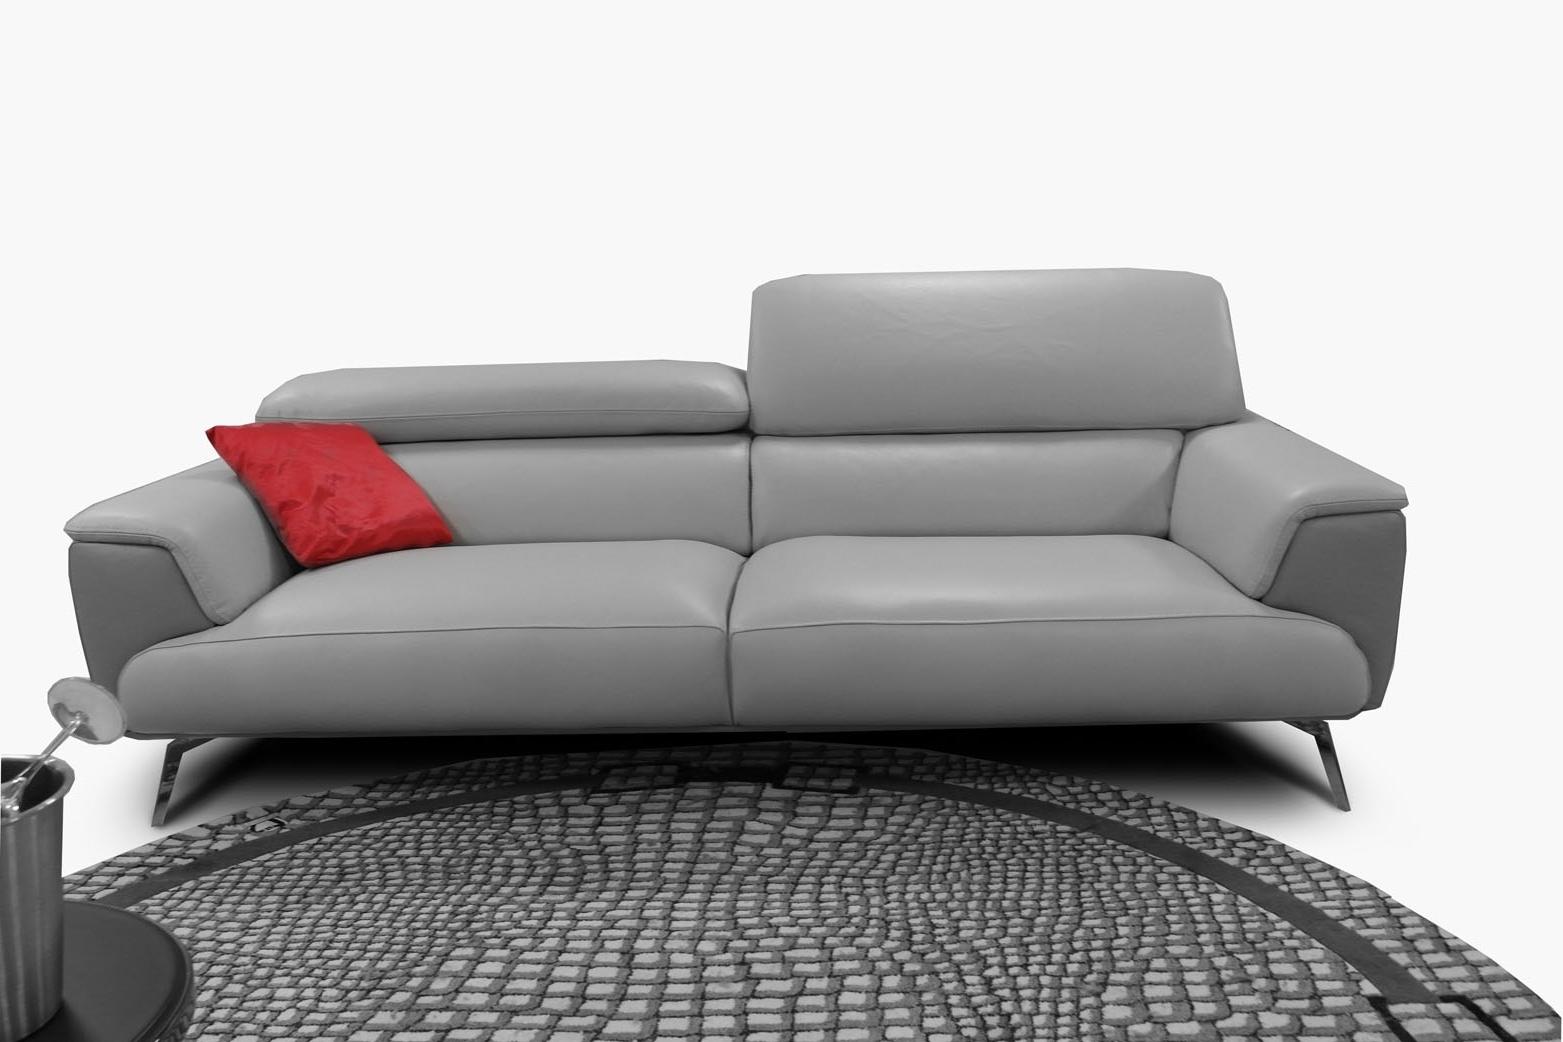 Round & Unusual Sofas • Nieribarcelona Inside Widely Used Unusual Sofa (View 7 of 20)